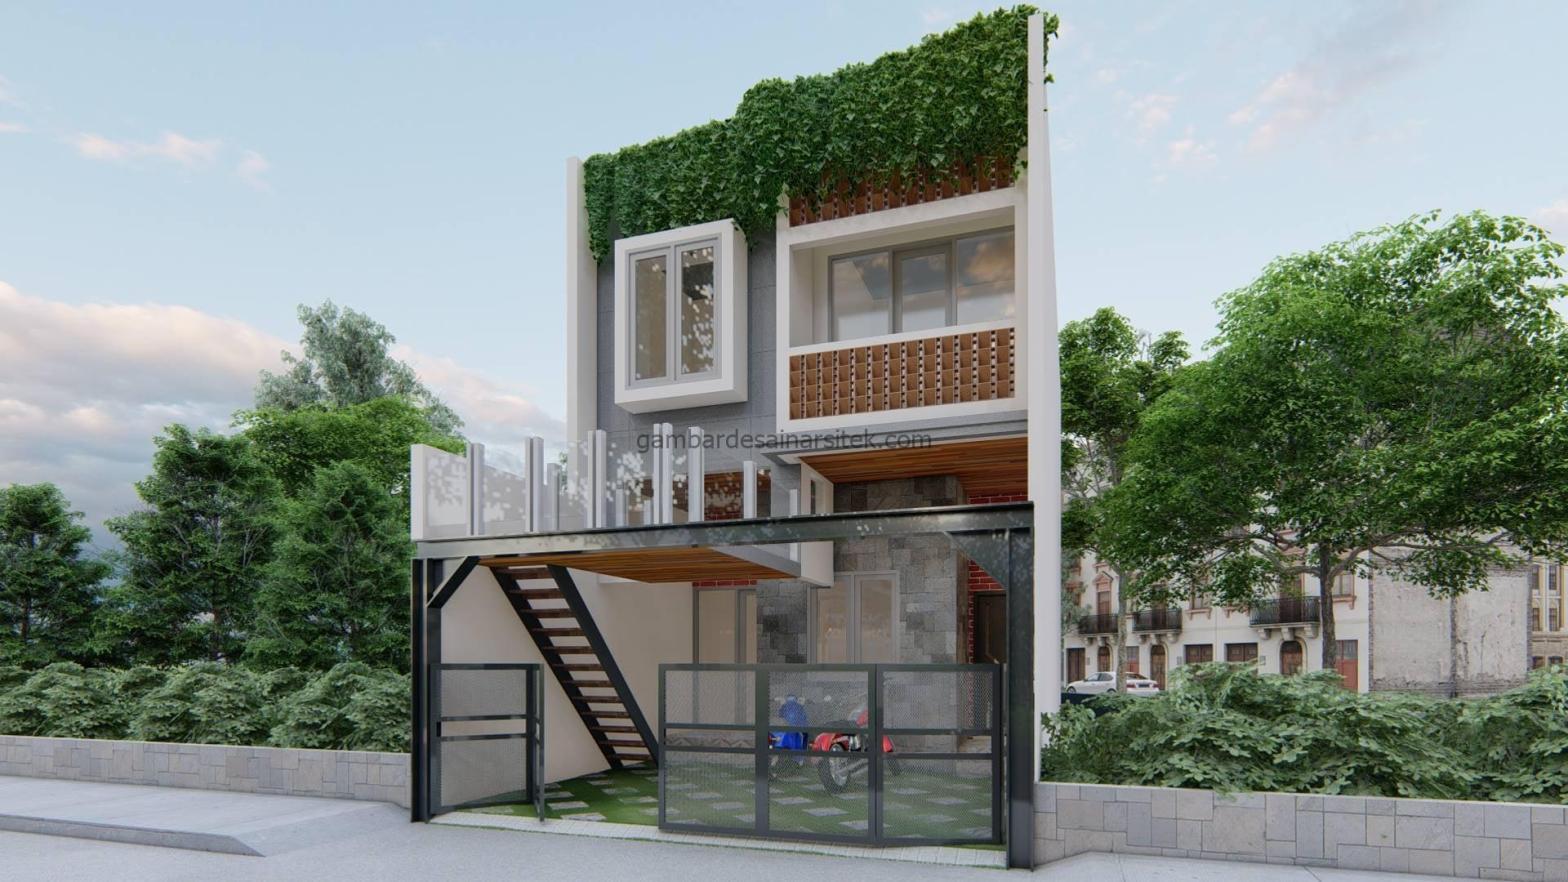 rumah minimalis 2 lantai dengan balkon mezzanine